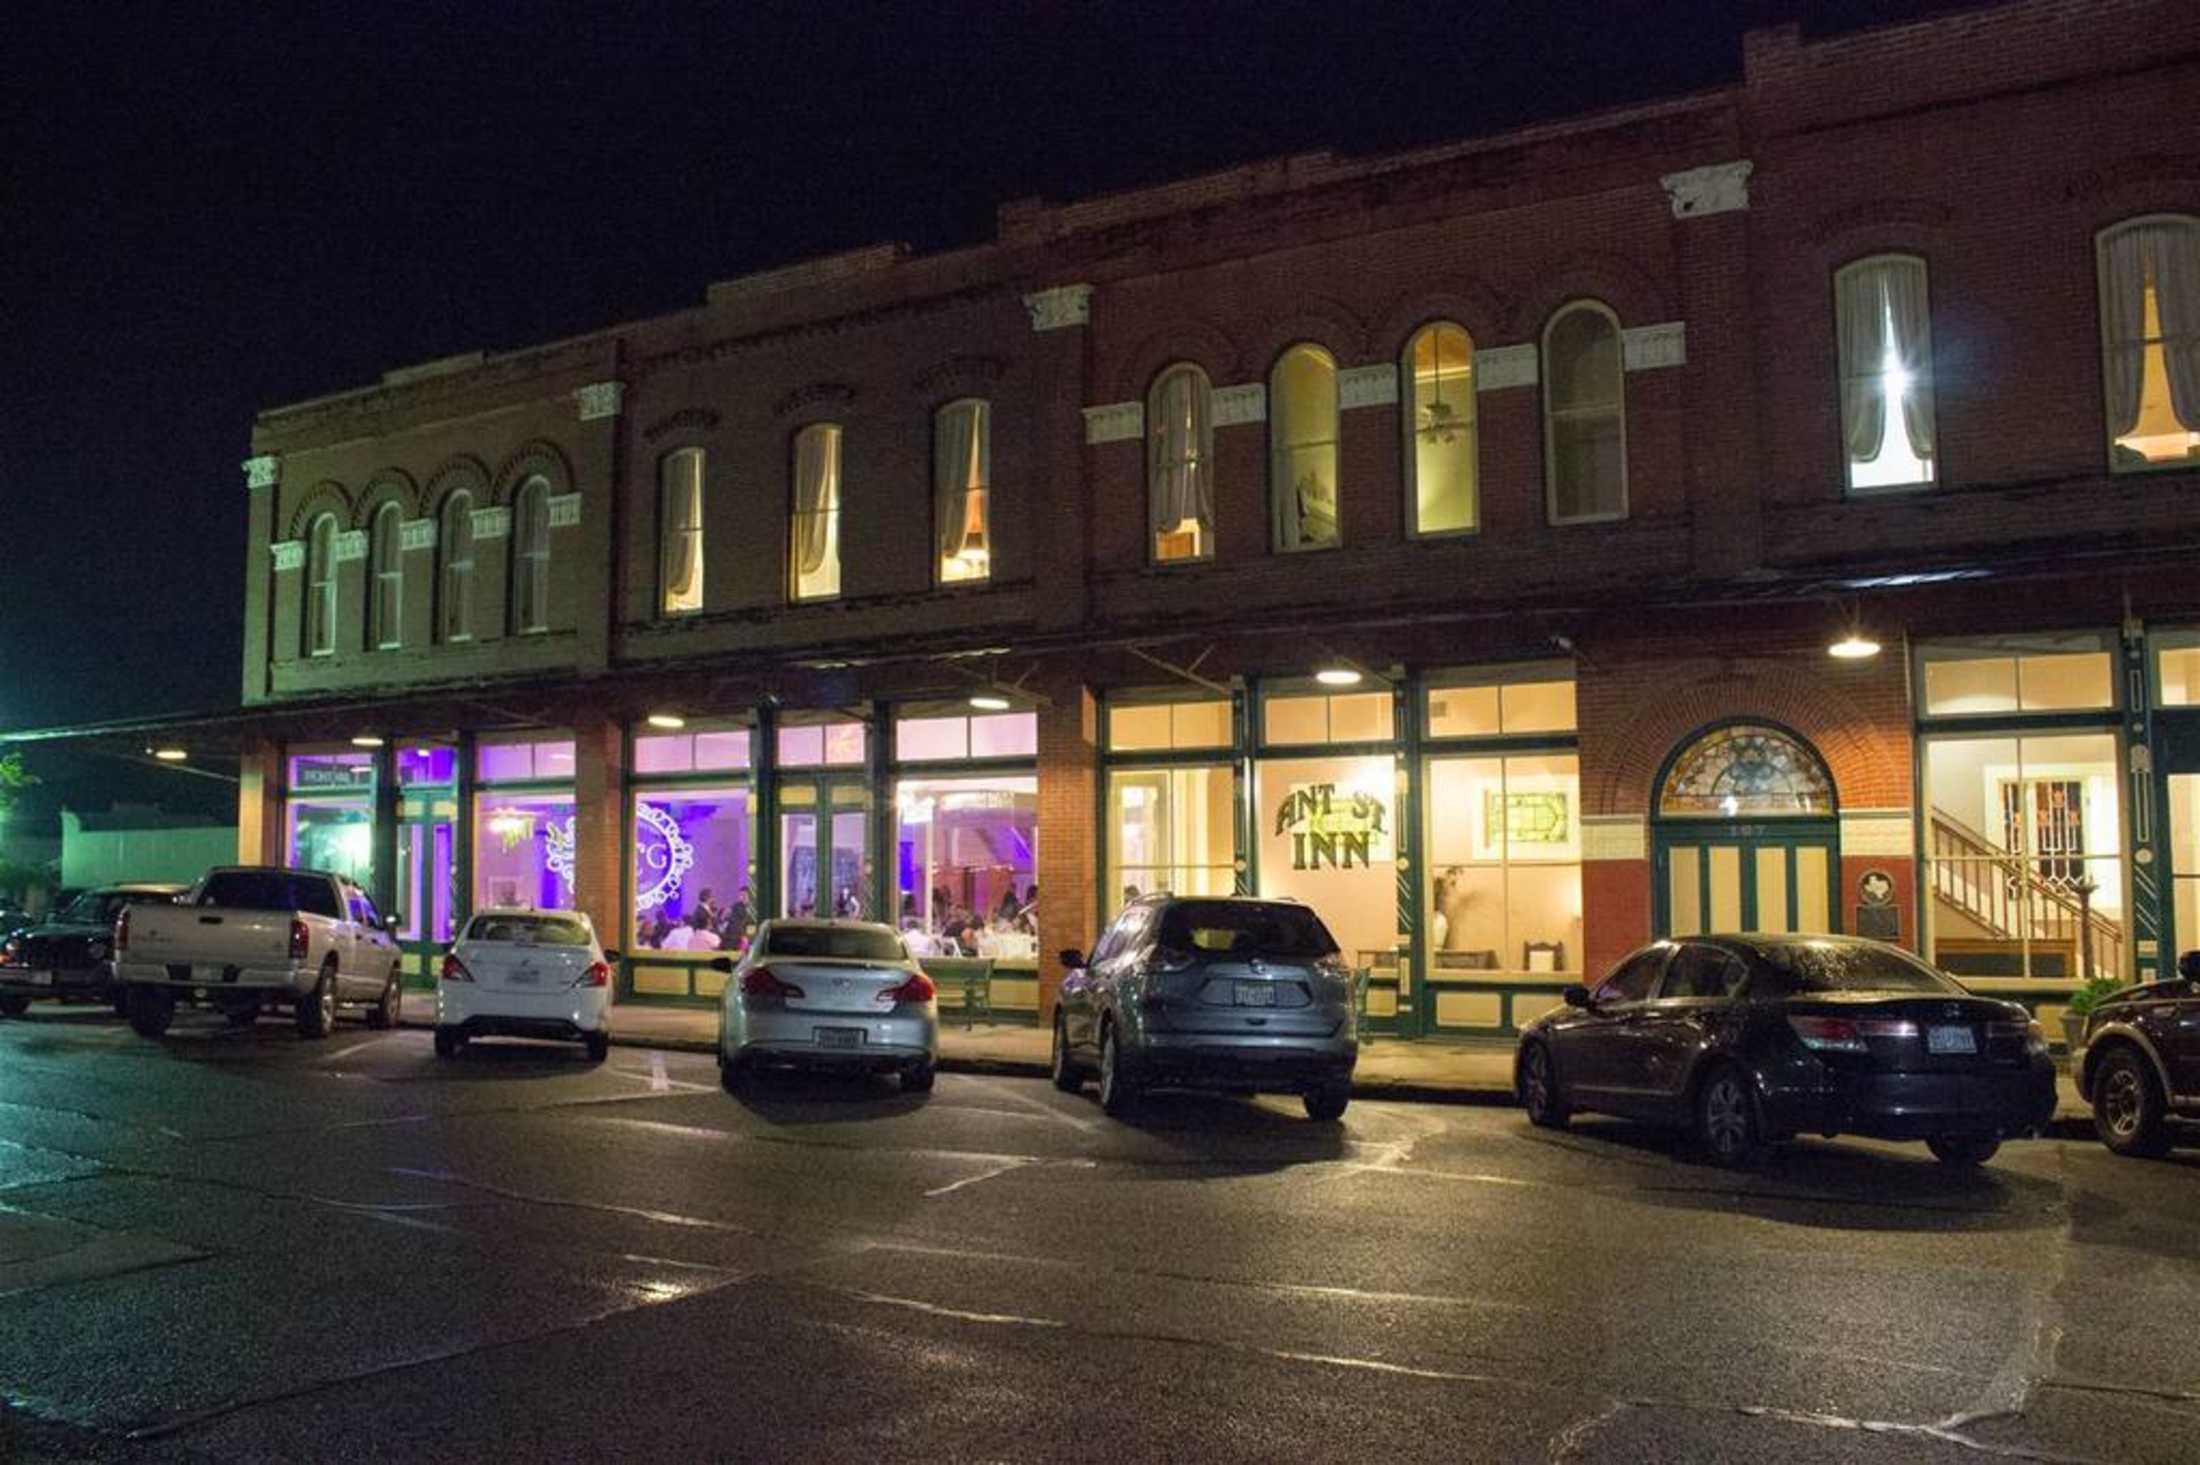 Brenham Tx Weddings And Receptions Venue Ant Street Inn